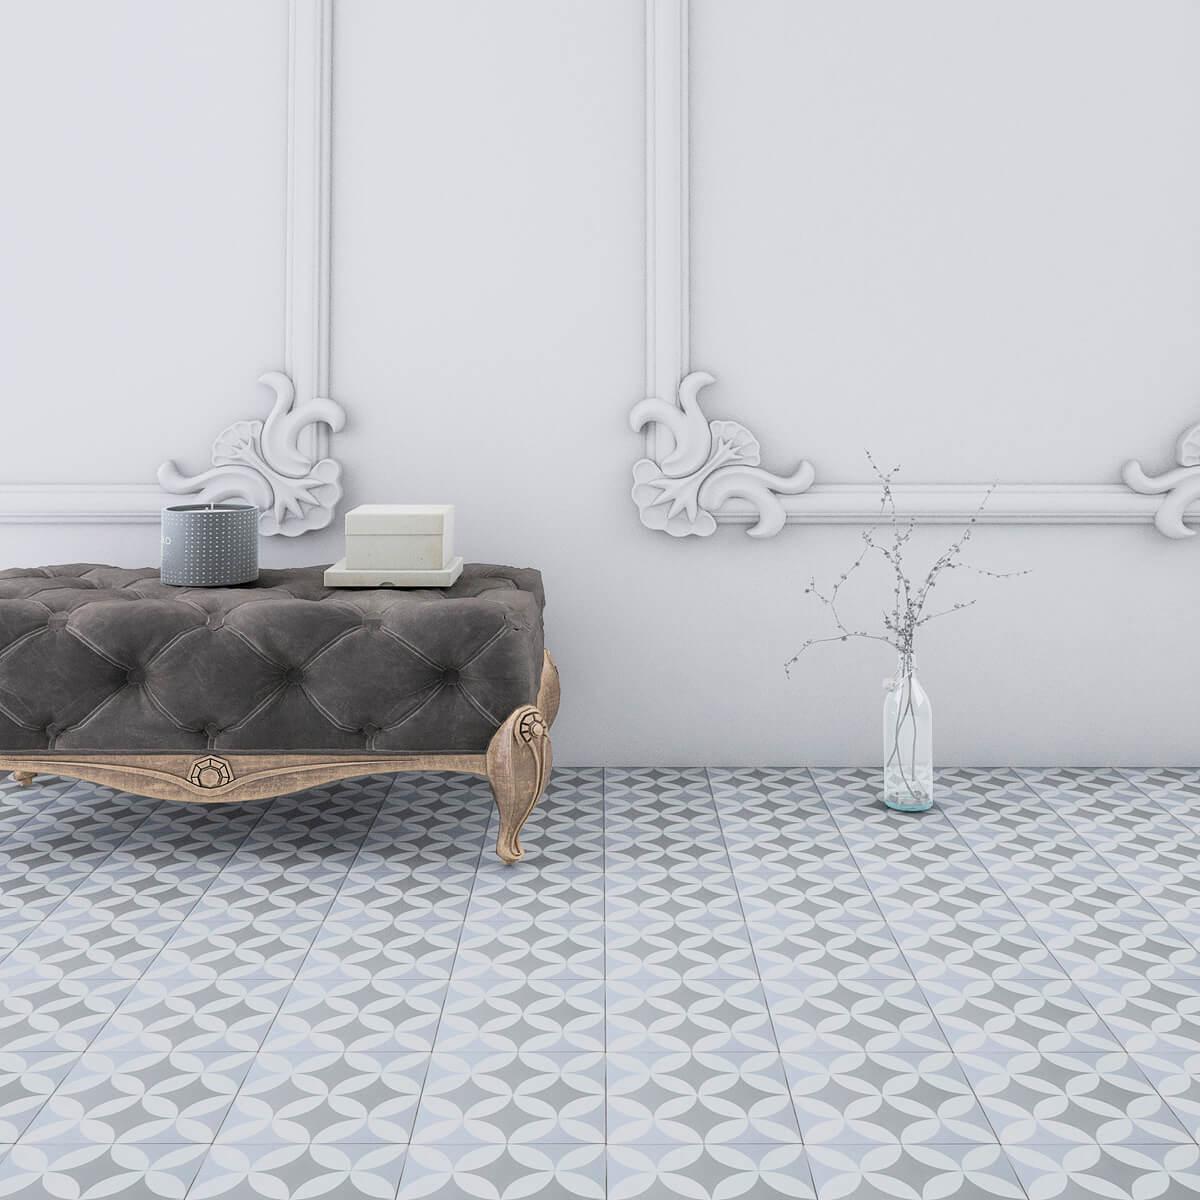 67- Catalogo Mosaicos- Mosaics Torras